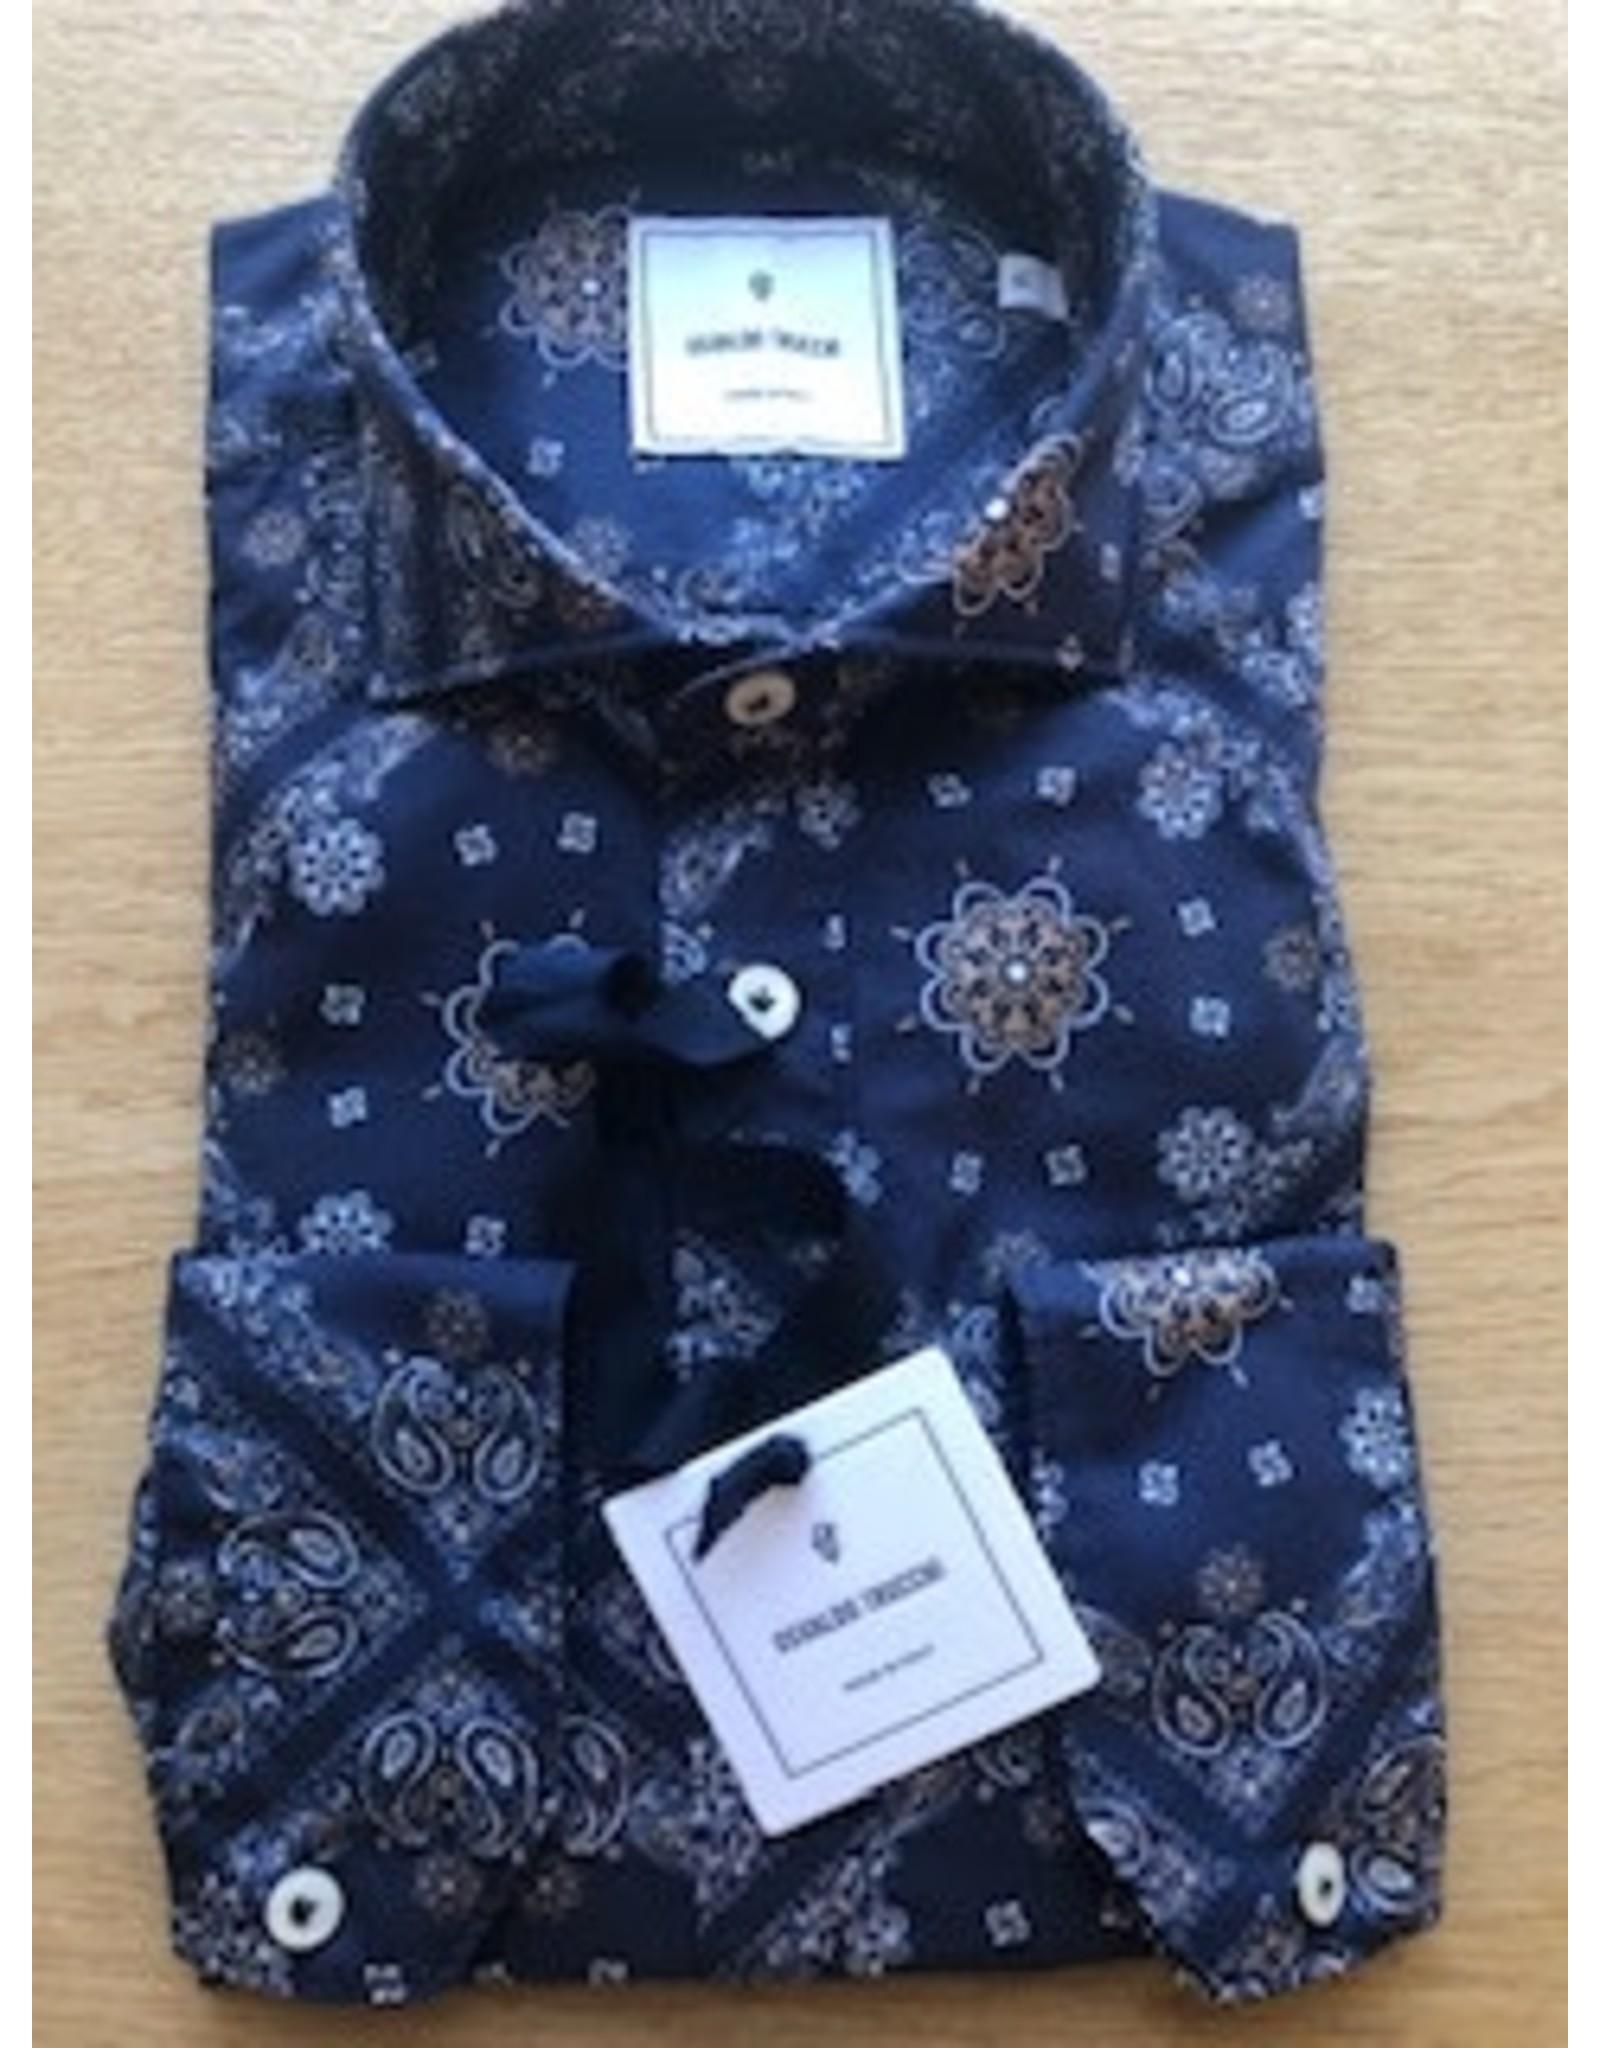 Osvaldo Trucchi Bandana Print Shirt